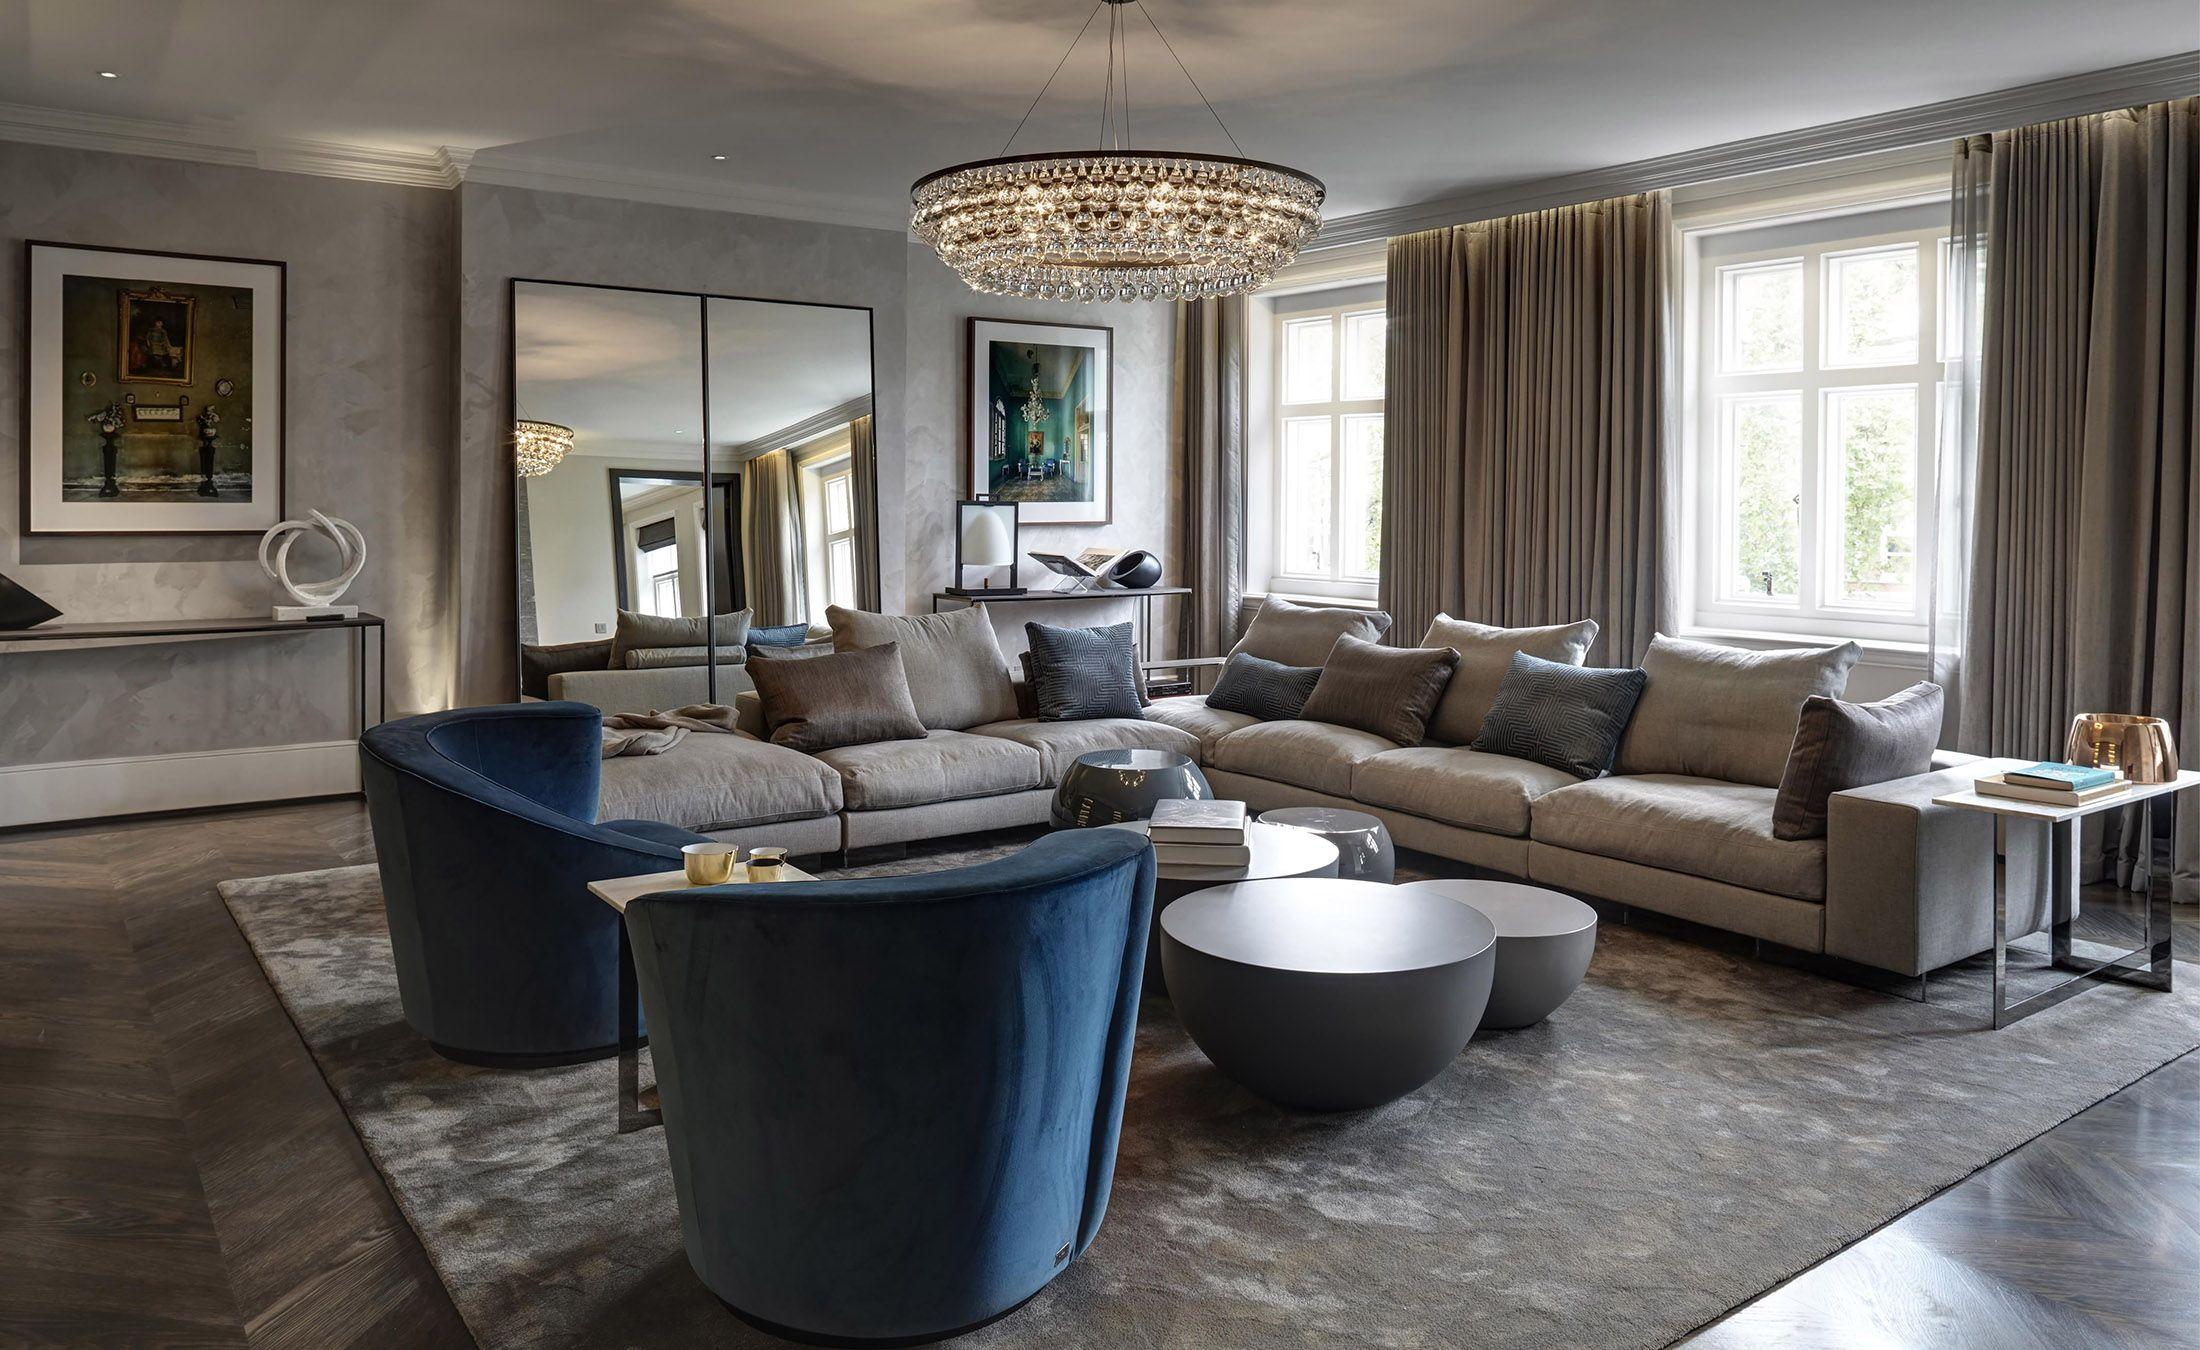 Interior Designed Living Rooms Alluring Staffan Tollgard Contemporary Interior Design  Living Room Inspiration Design